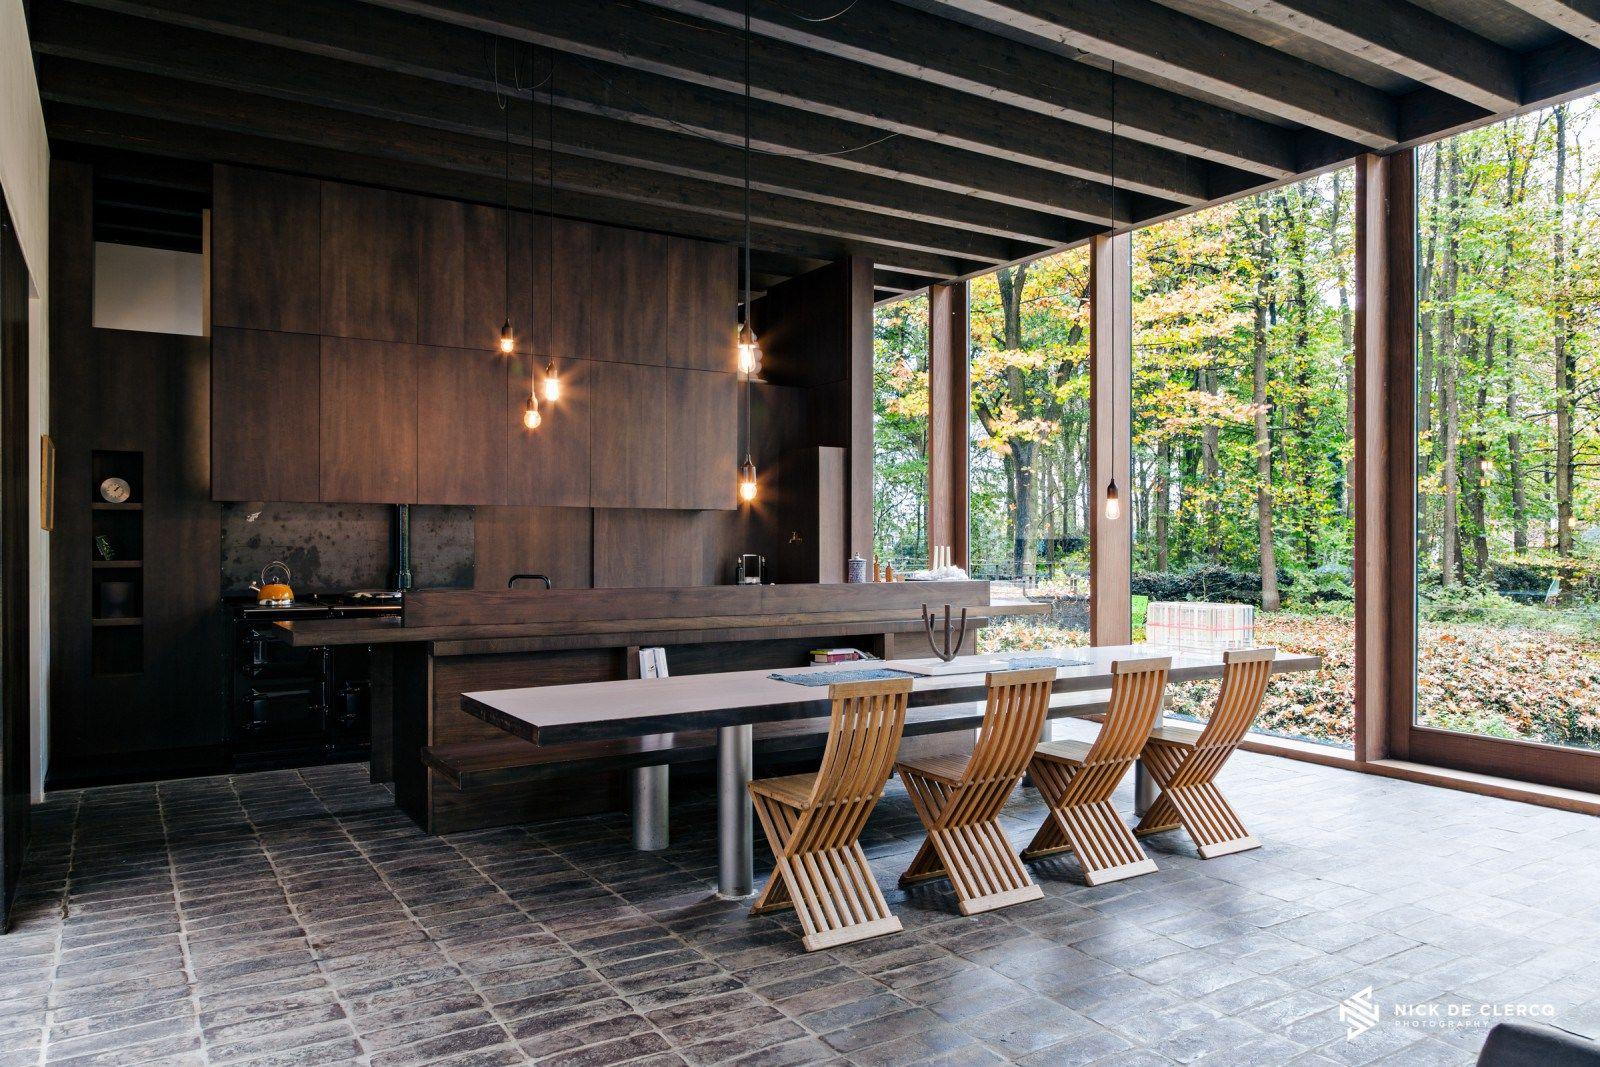 wabi-sabi architecture - nick de clercq photography   kitchen